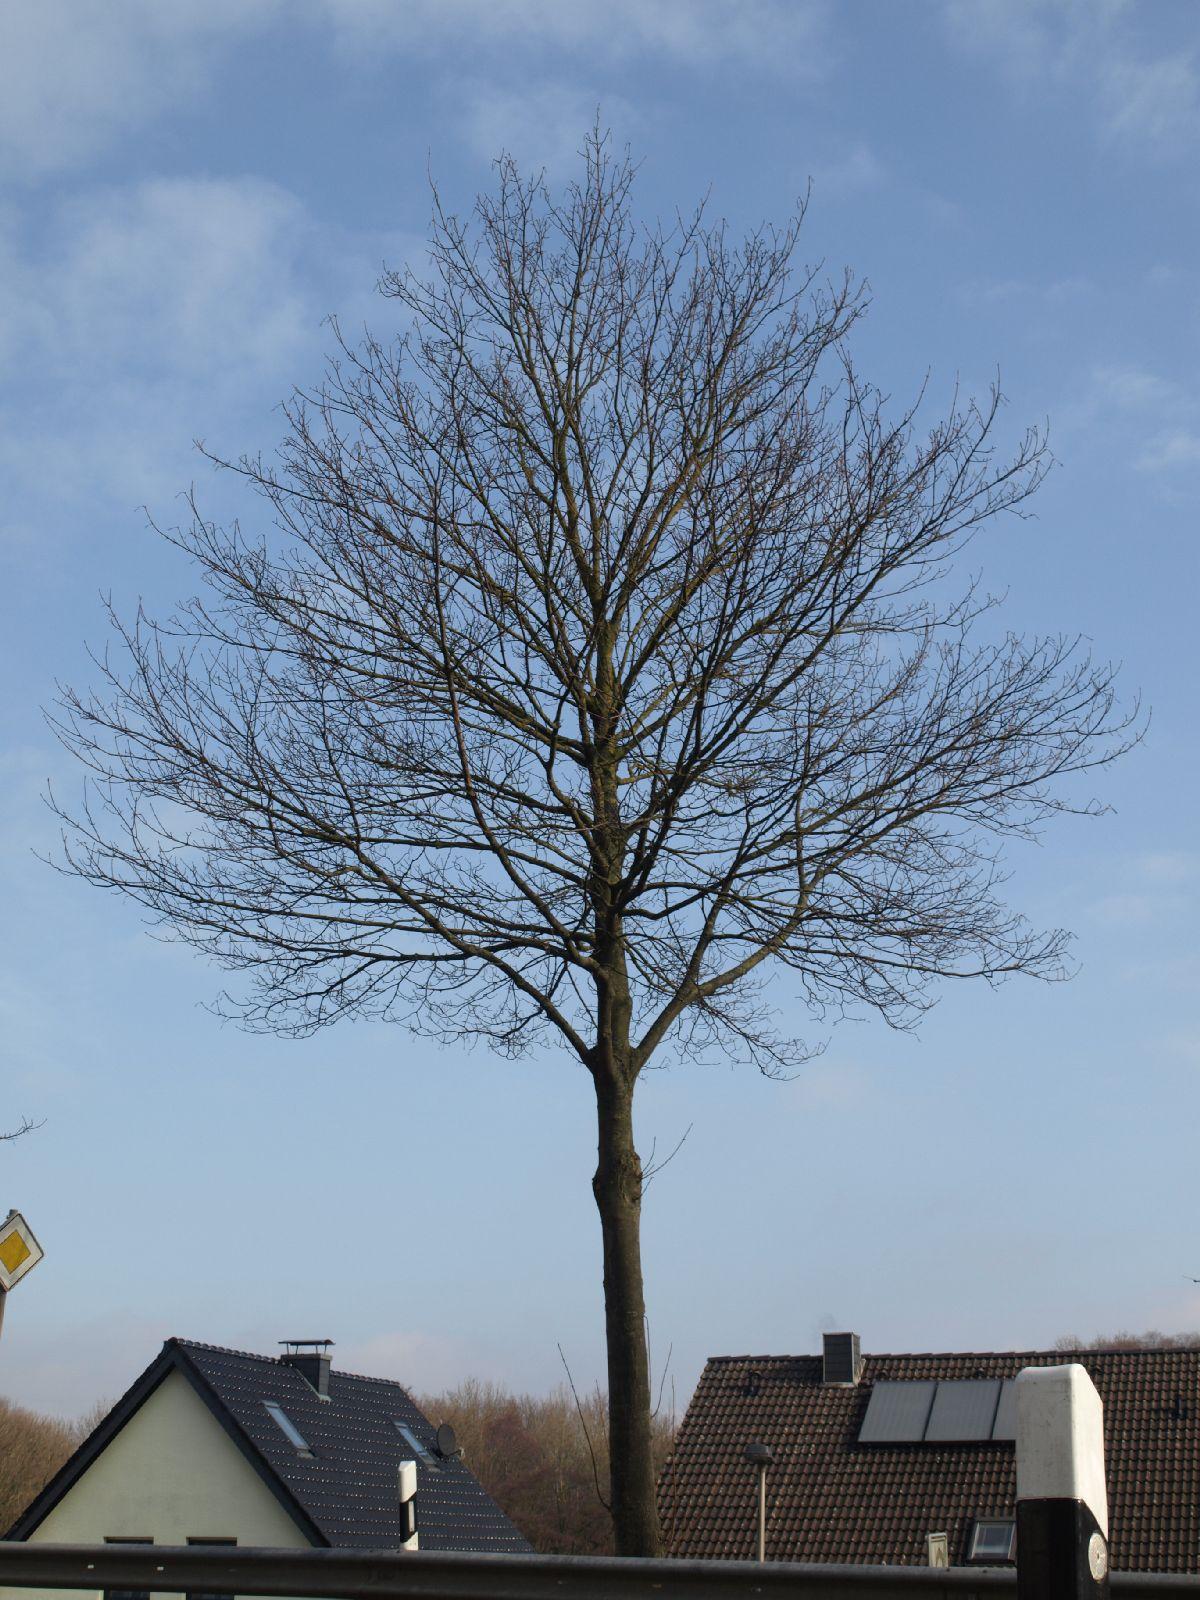 Pflanzen-Baum-Silhouette-Foto_Textur_B_P3071195